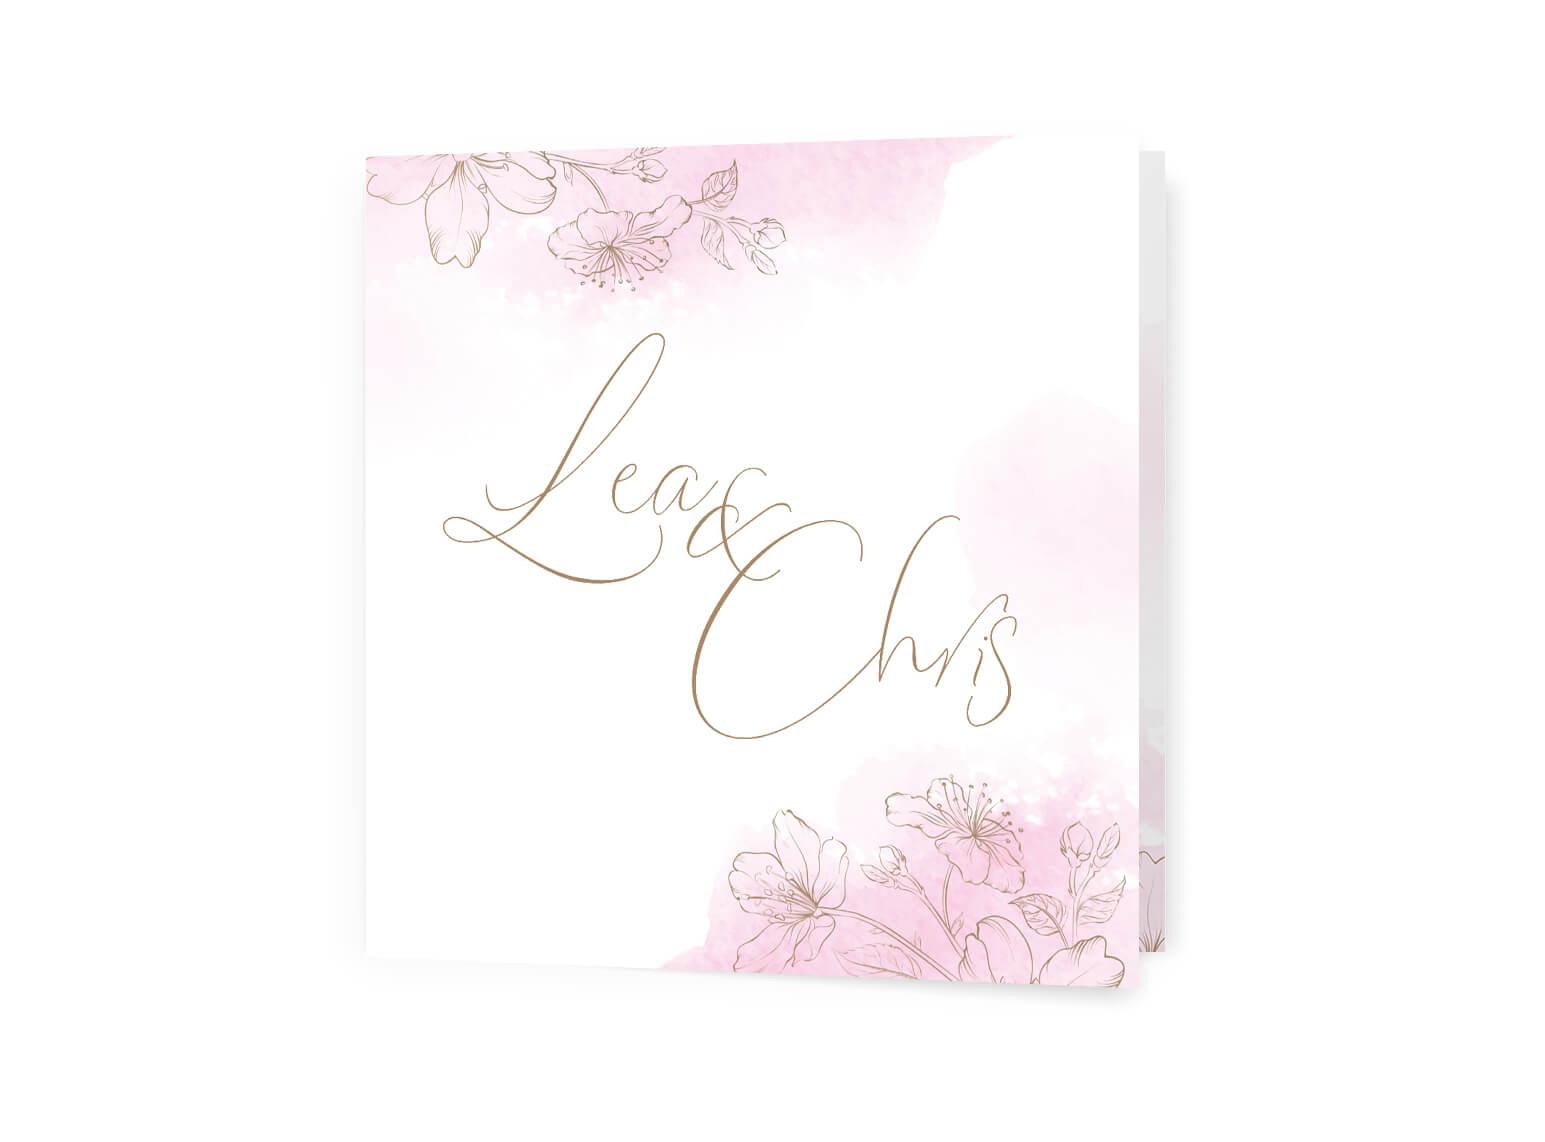 hochzeitseinladung-klappkarte-quadrat-rosa-aquarell-gold-blumen_aussen_MP0013-2.0.3